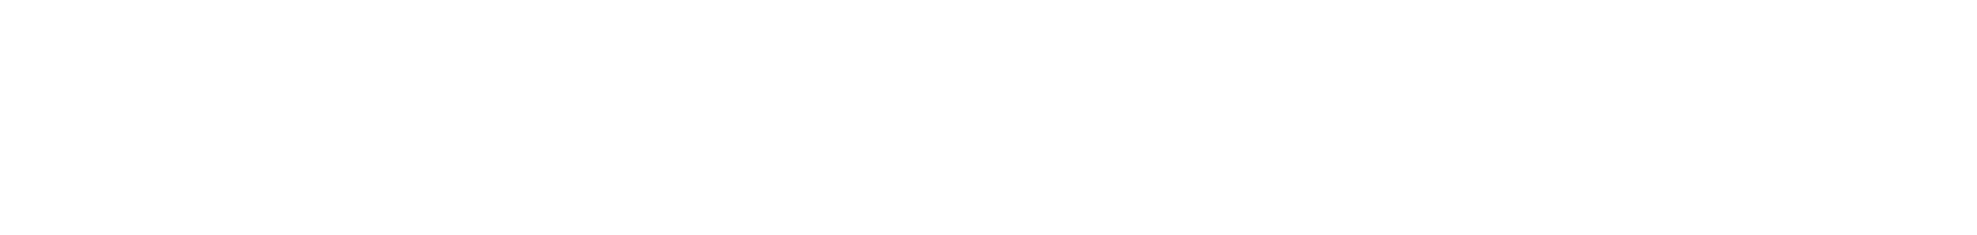 Documentary Australia Foundation (DAF) Logo